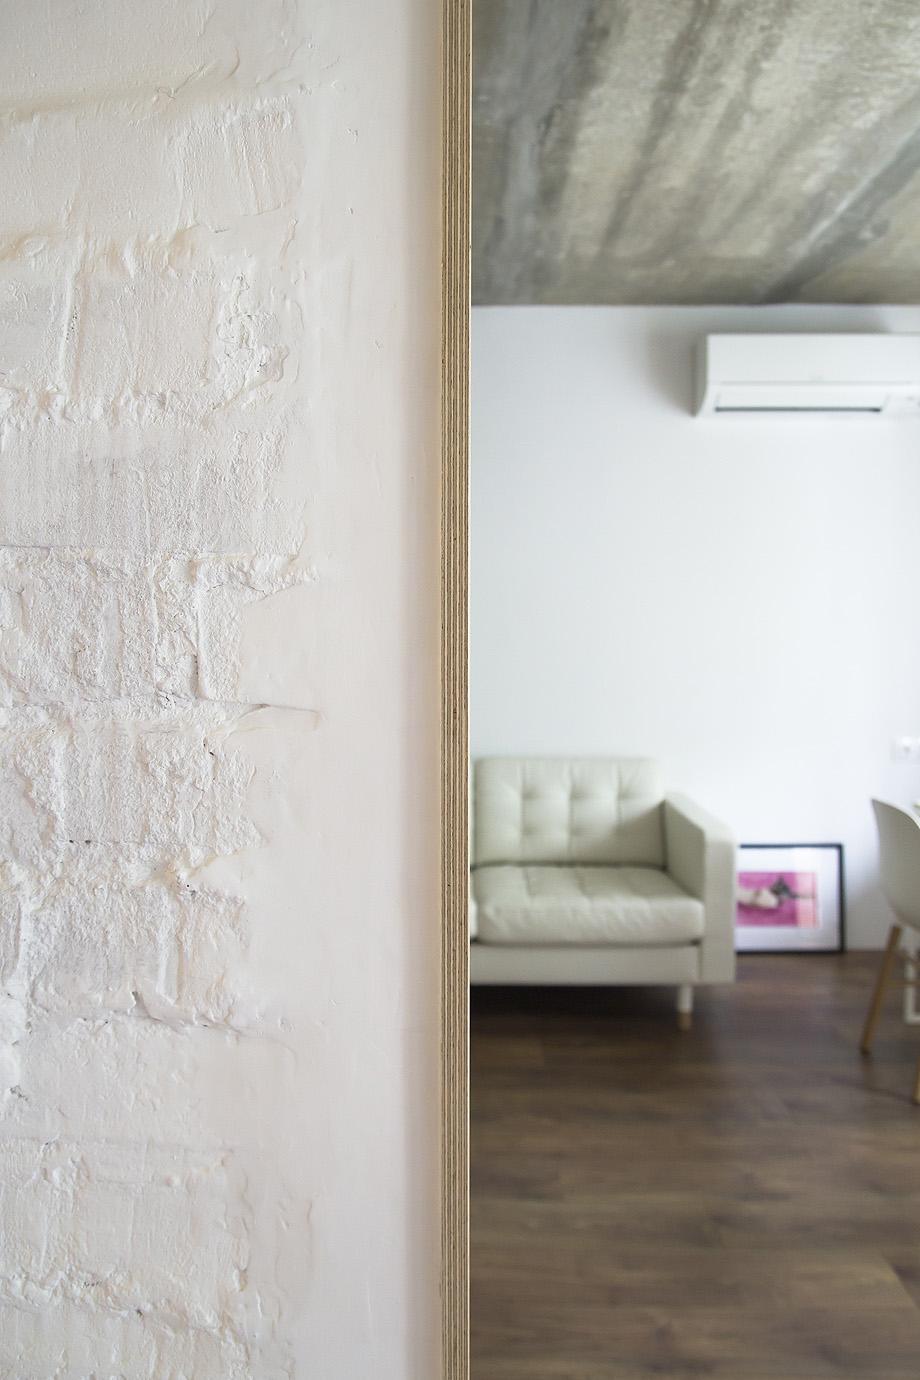 apartamento en rusia por kdva architects - foto daria koloskova (9)